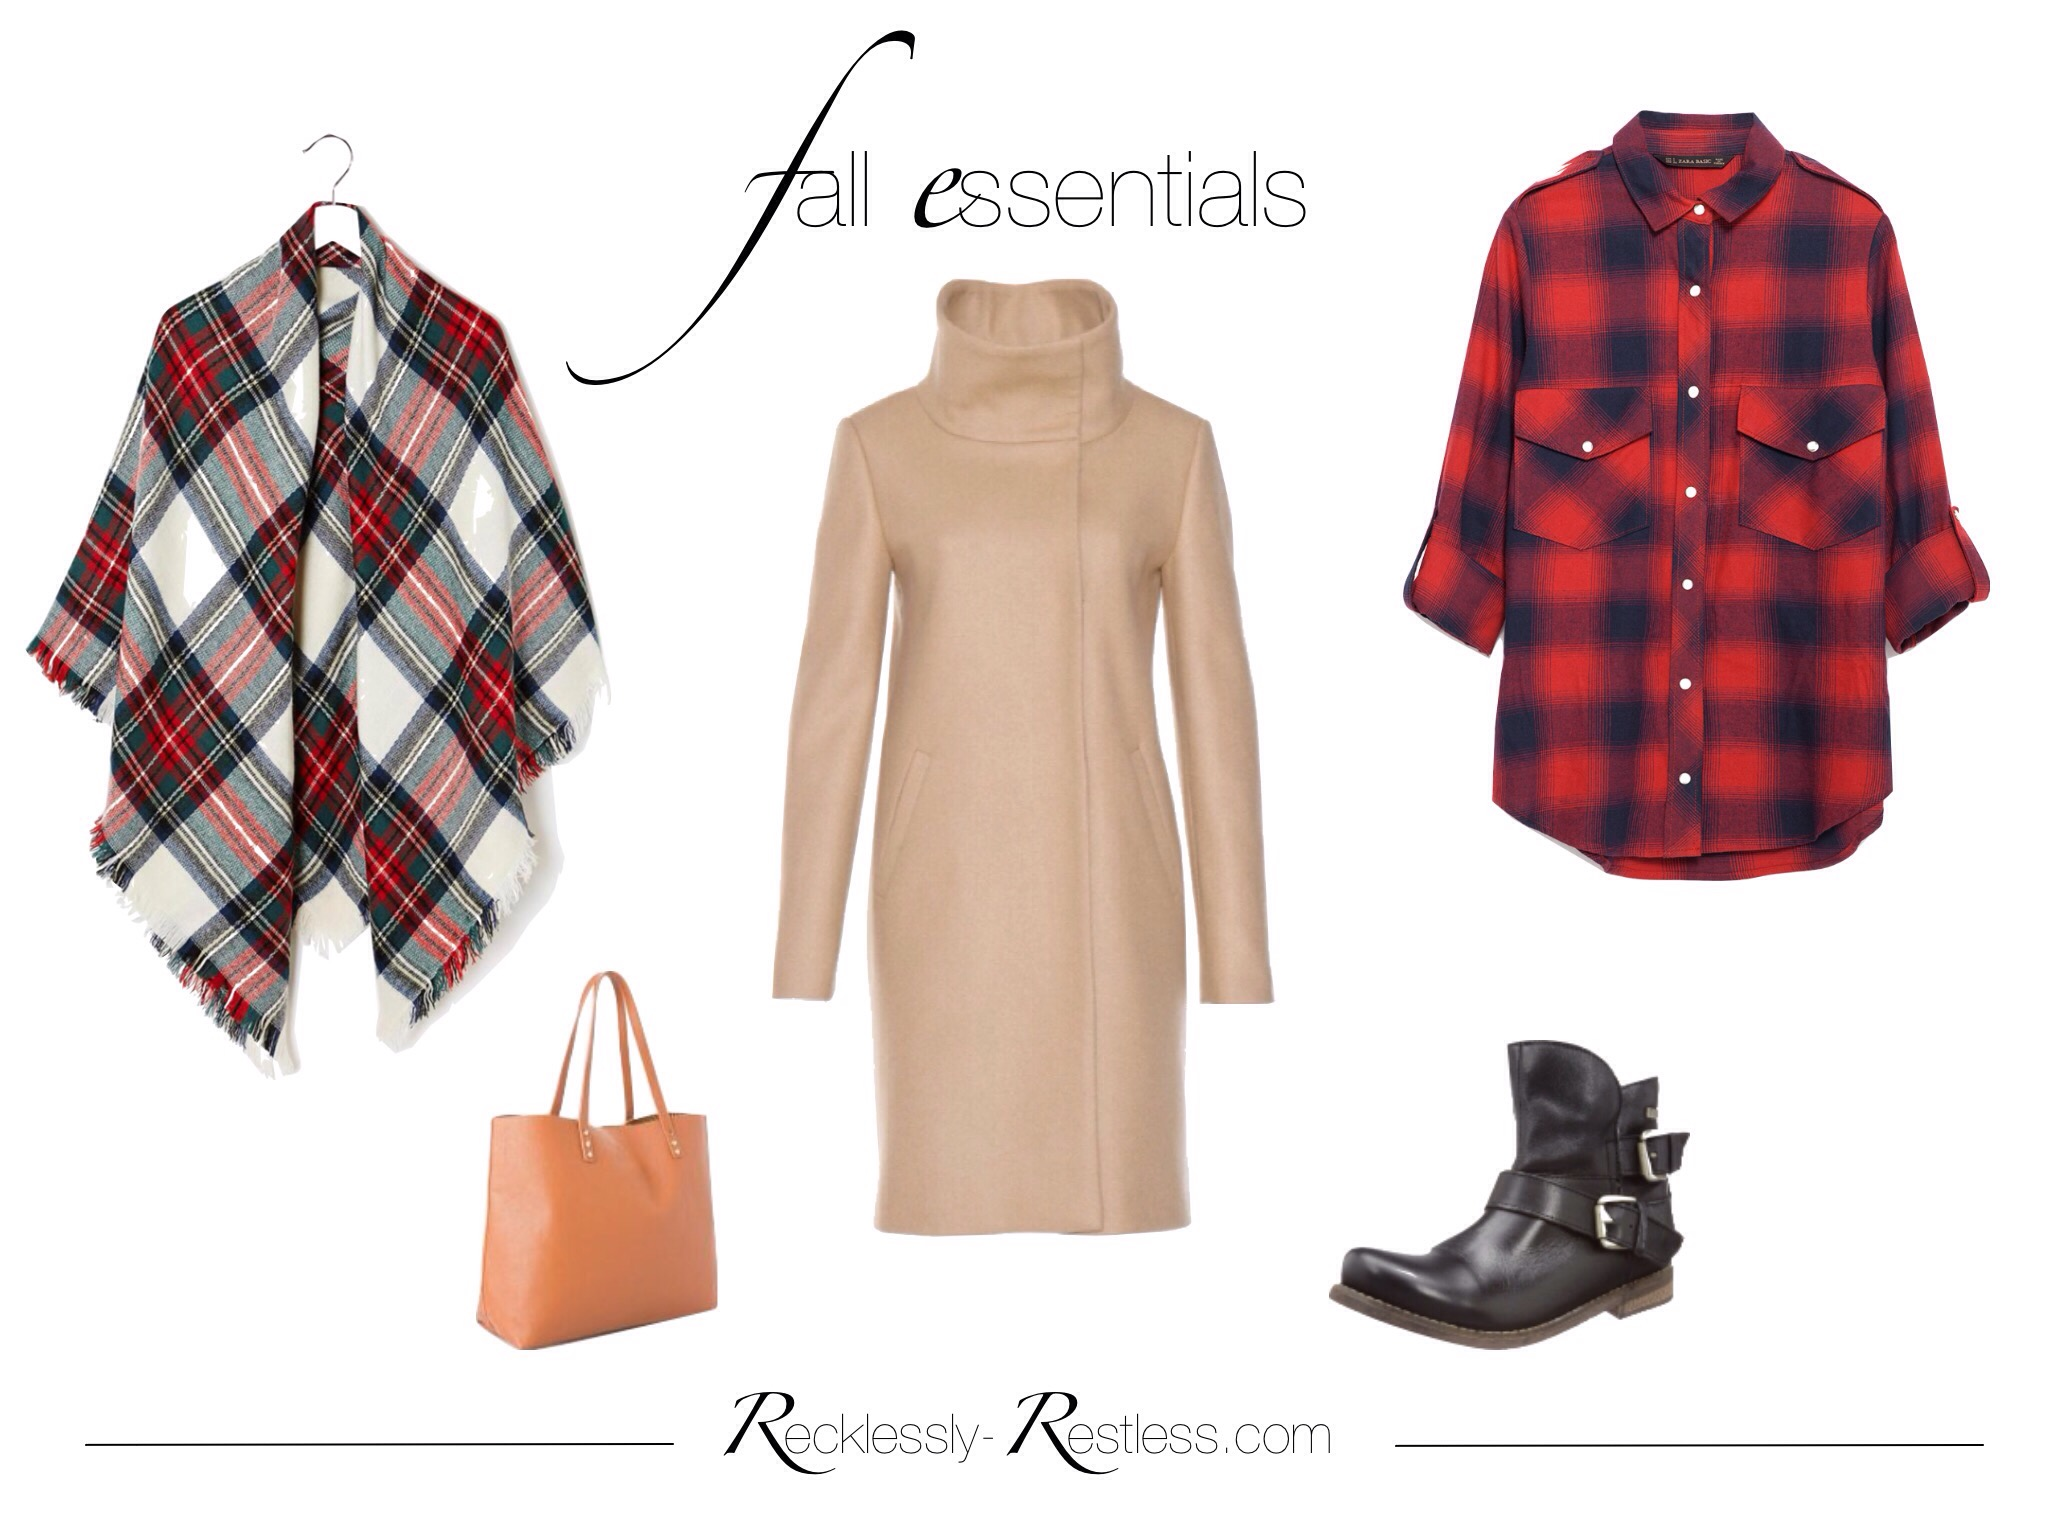 Fall Essentials - 5 Modeklassiker für den Herbst